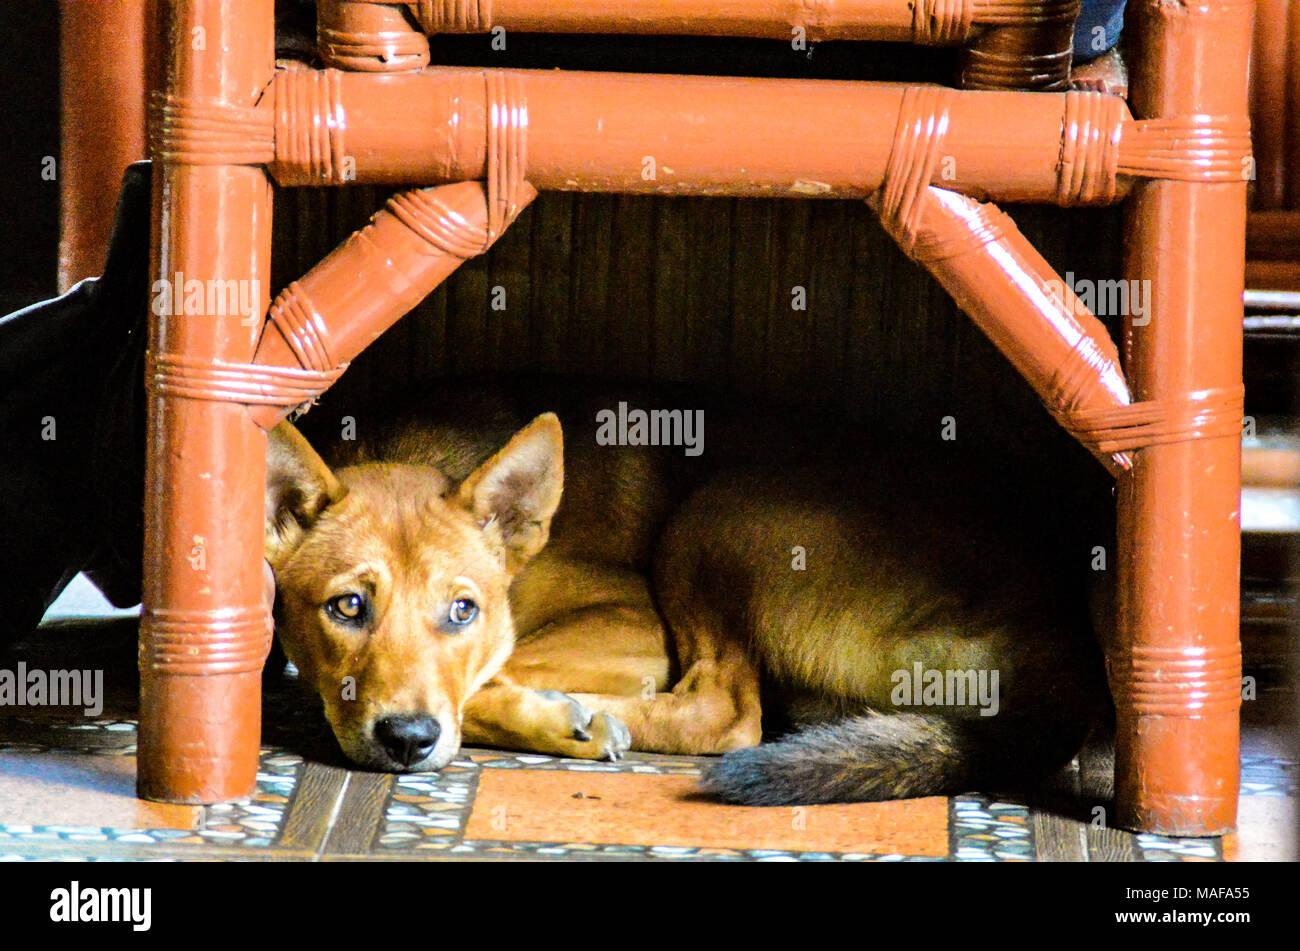 A dog sleeping under a bamboo chair in Bukit Lawang, North Sumatra Indonesia - Stock Image